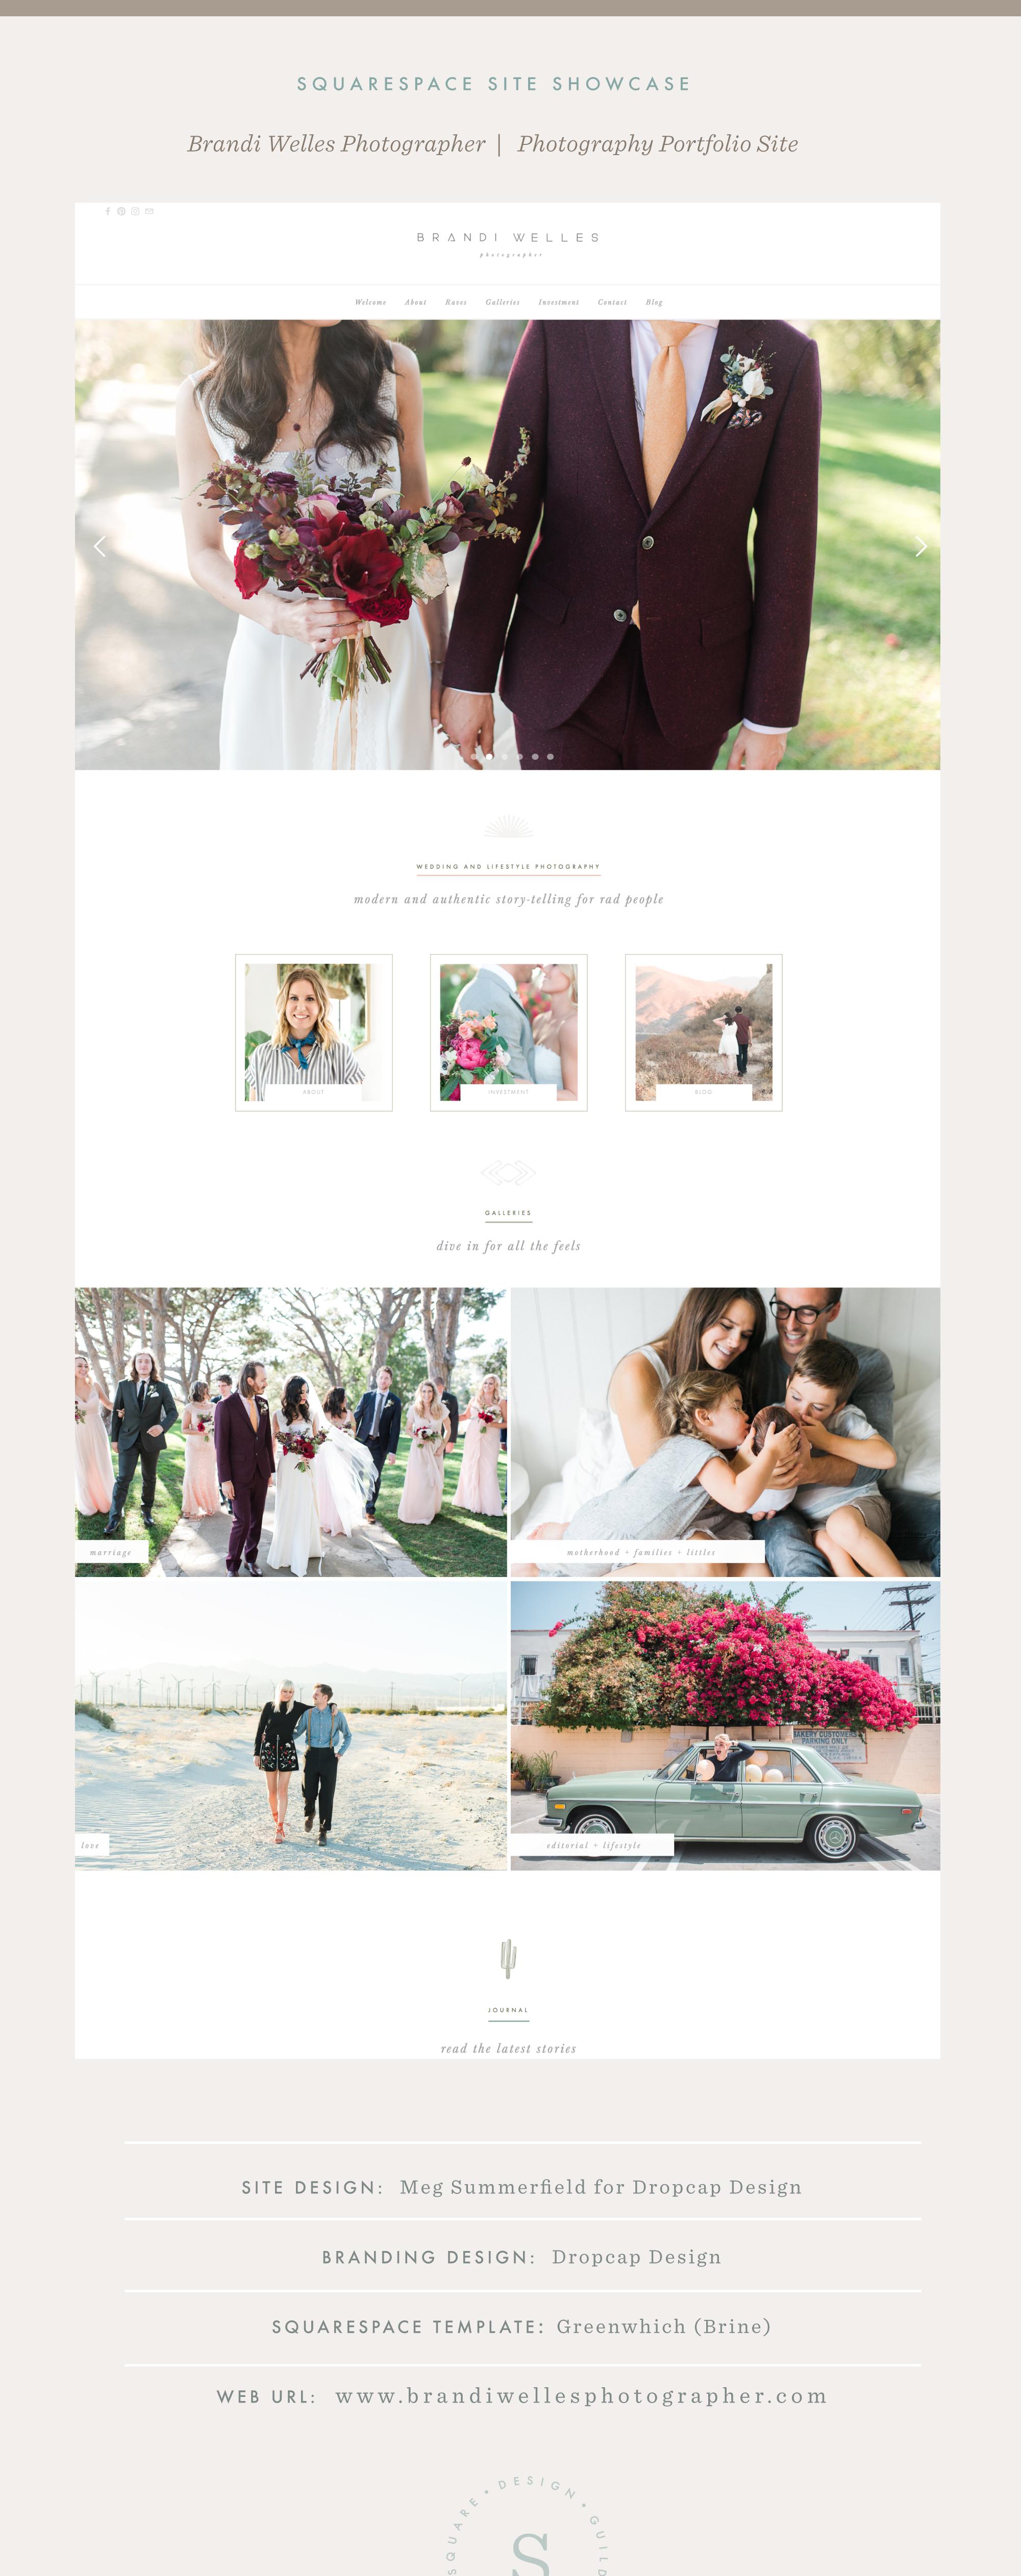 Squarespace Site Showcase | Brandi Welles Photographer | Brine Template | Dropcap Design and Meg Summerfield Studio